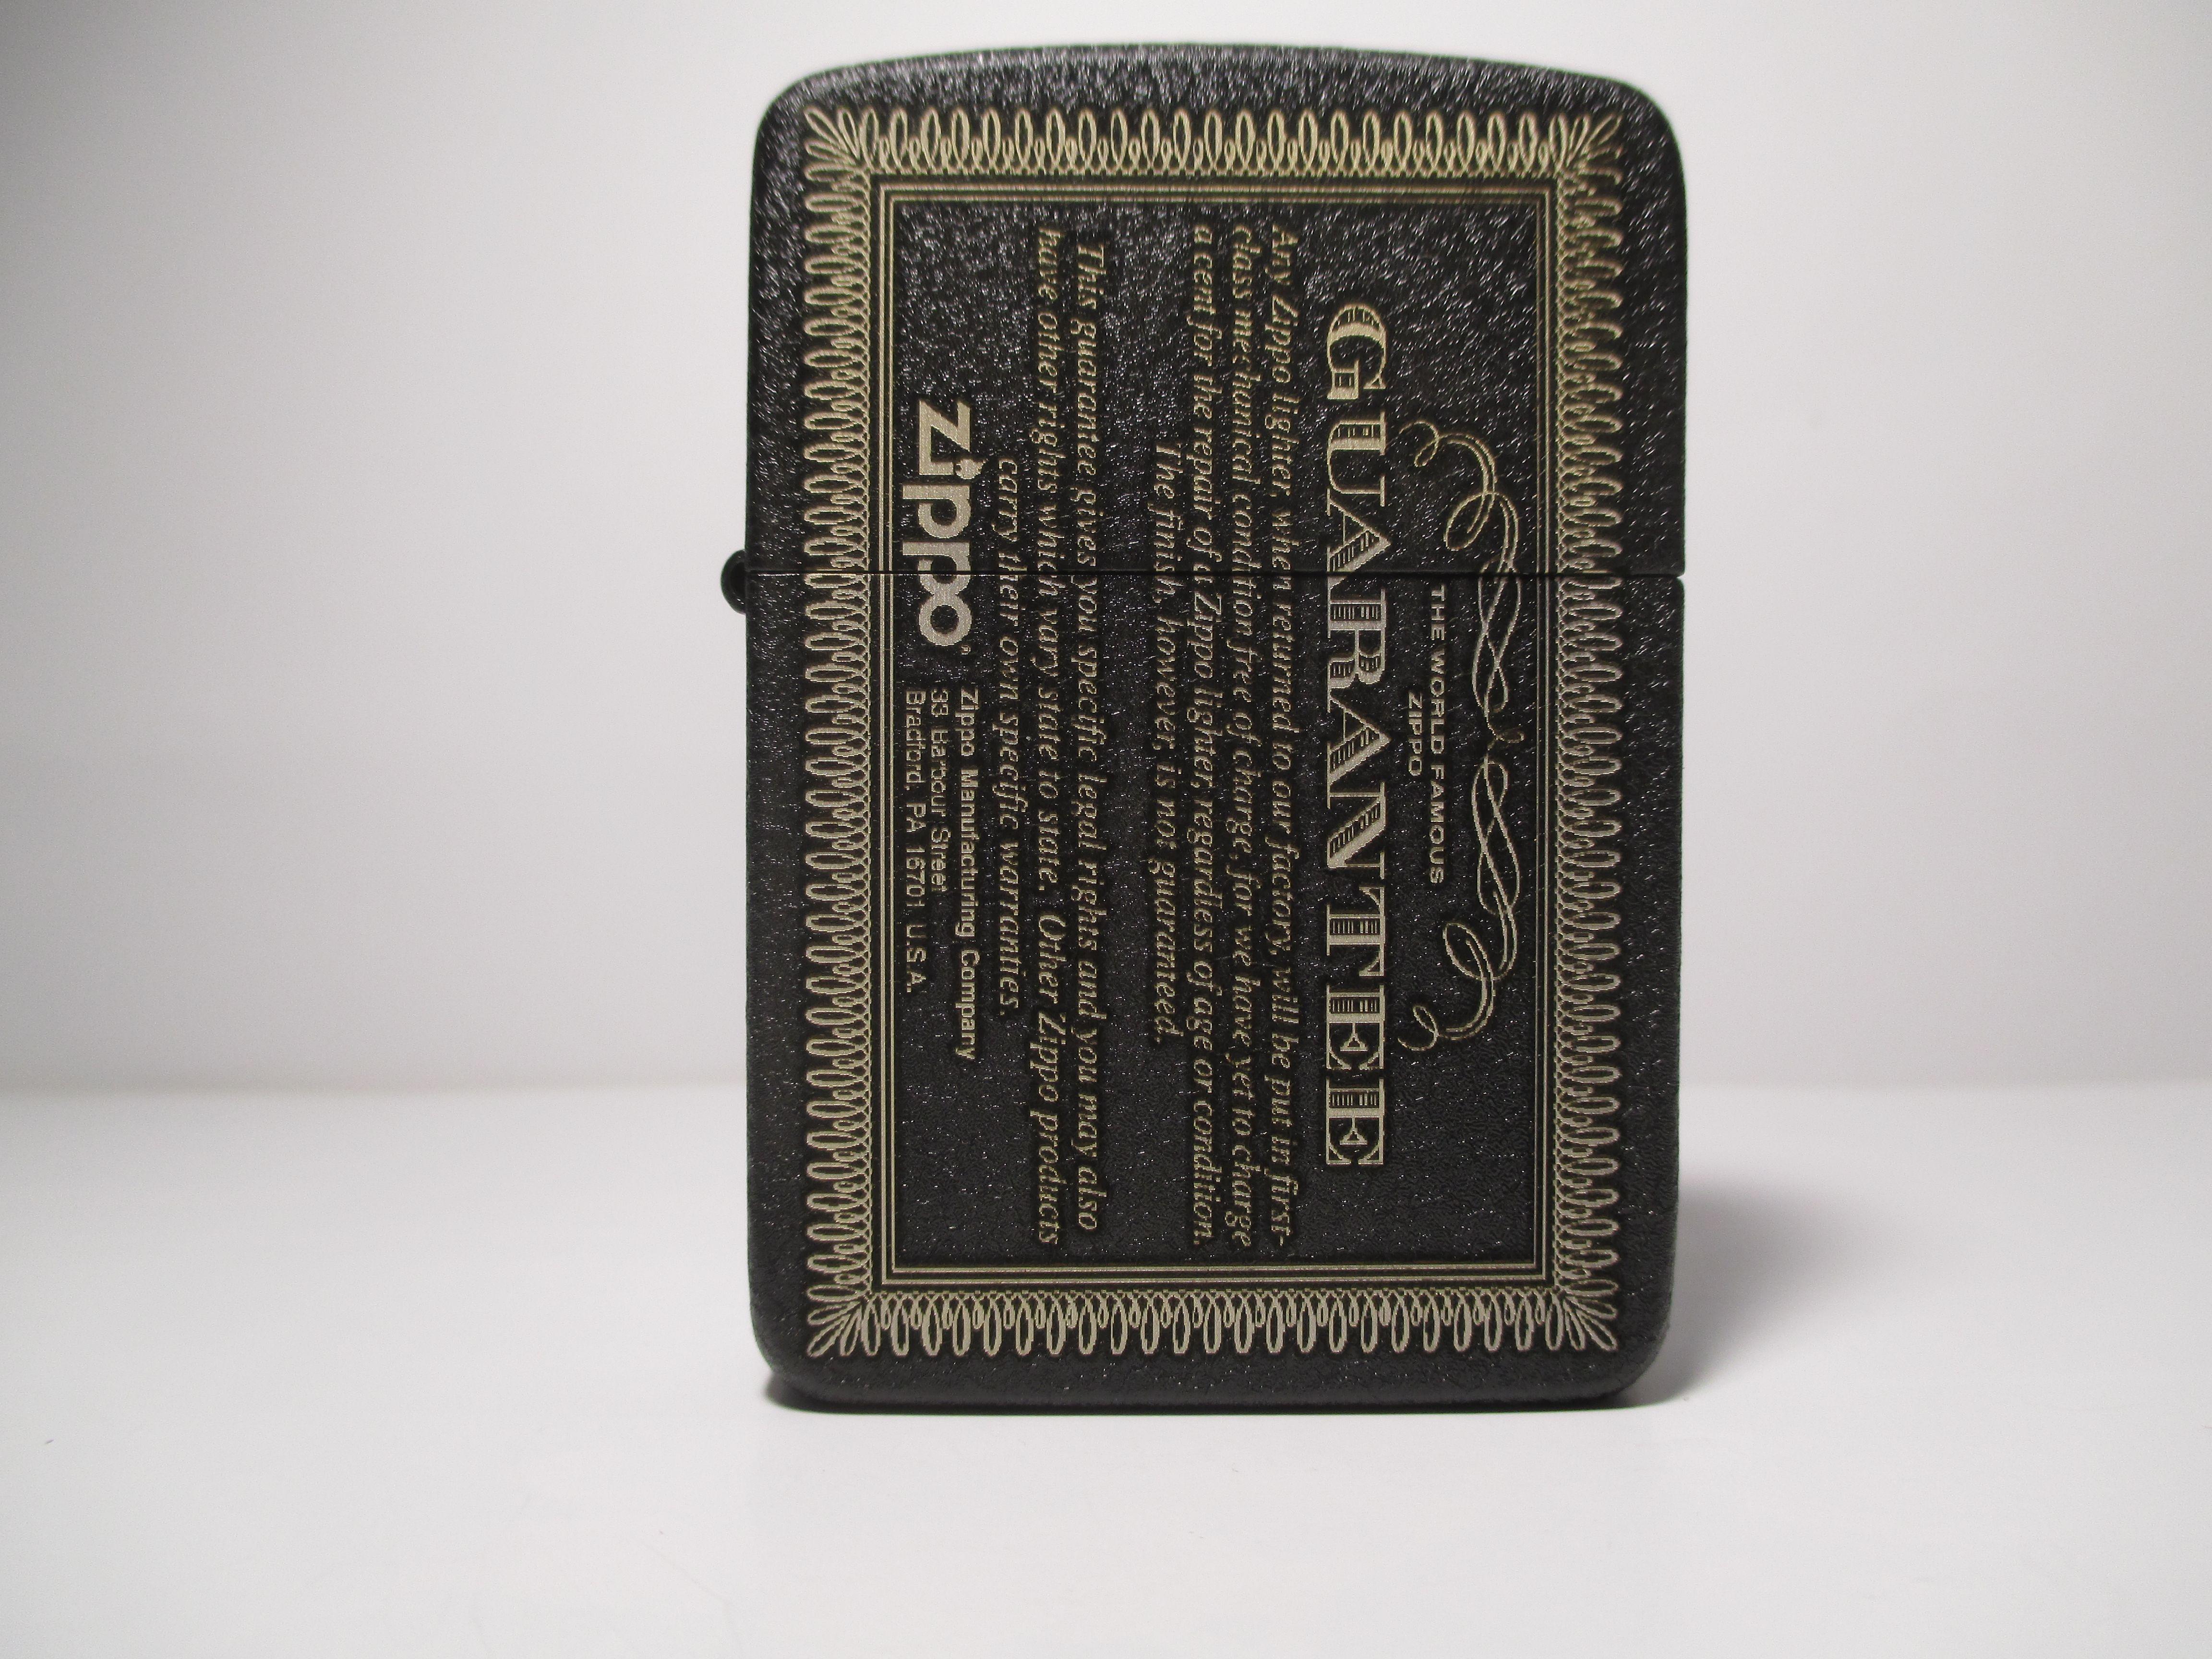 Zippo Guarantee 1941 Replica Black Crackle Custom Deep Laser Engraving Zippo Zippo Limited Edition Zippo Lighter